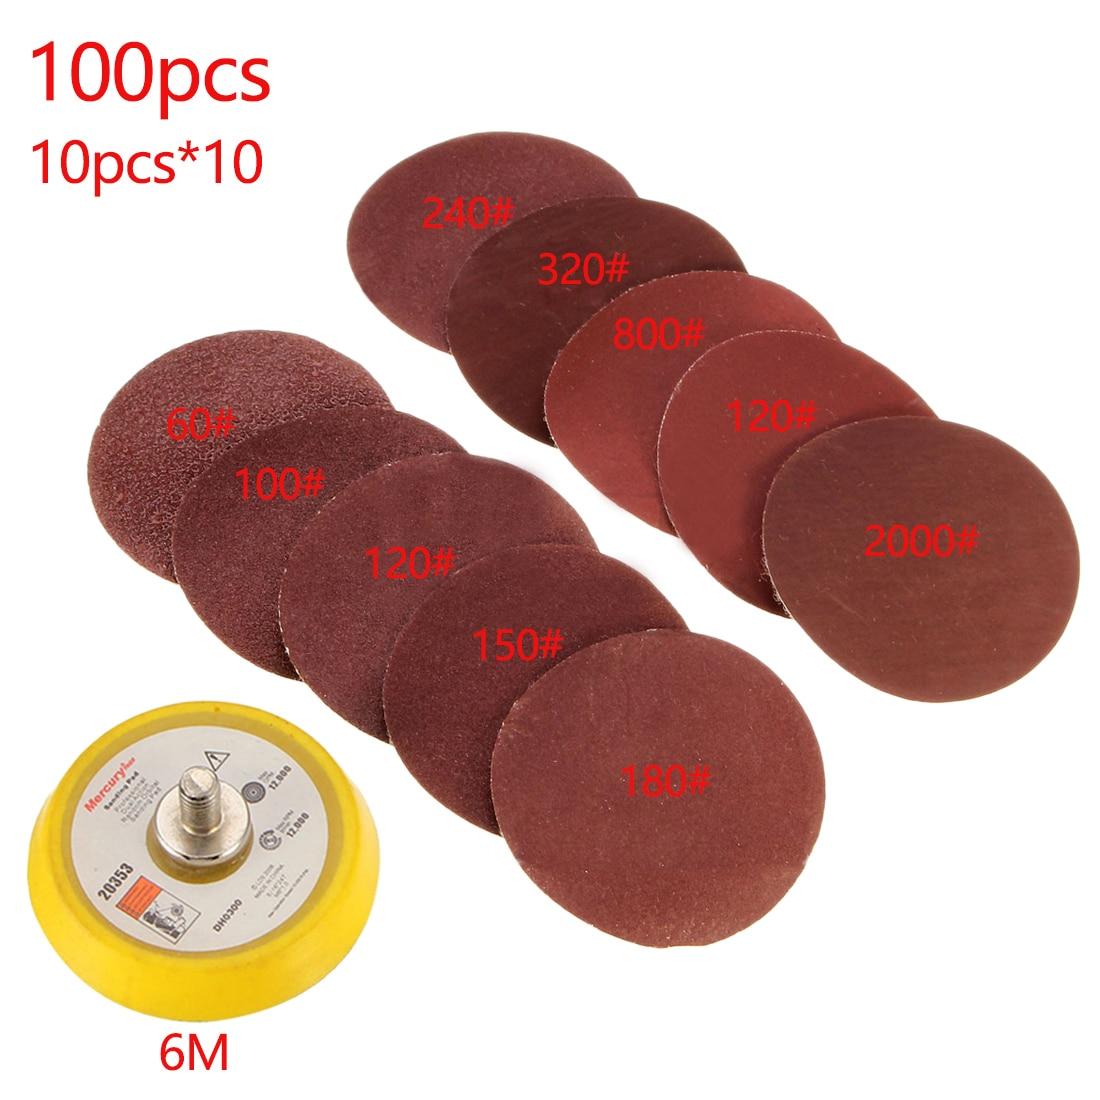 100 pçs/set Durável 50mm 60-2000 Grão Sander Disco de Papel + 1pc Placa de Gancho Loop Fit Dremel 4000 Moedor Elétrico Ferramentas Abrasivas